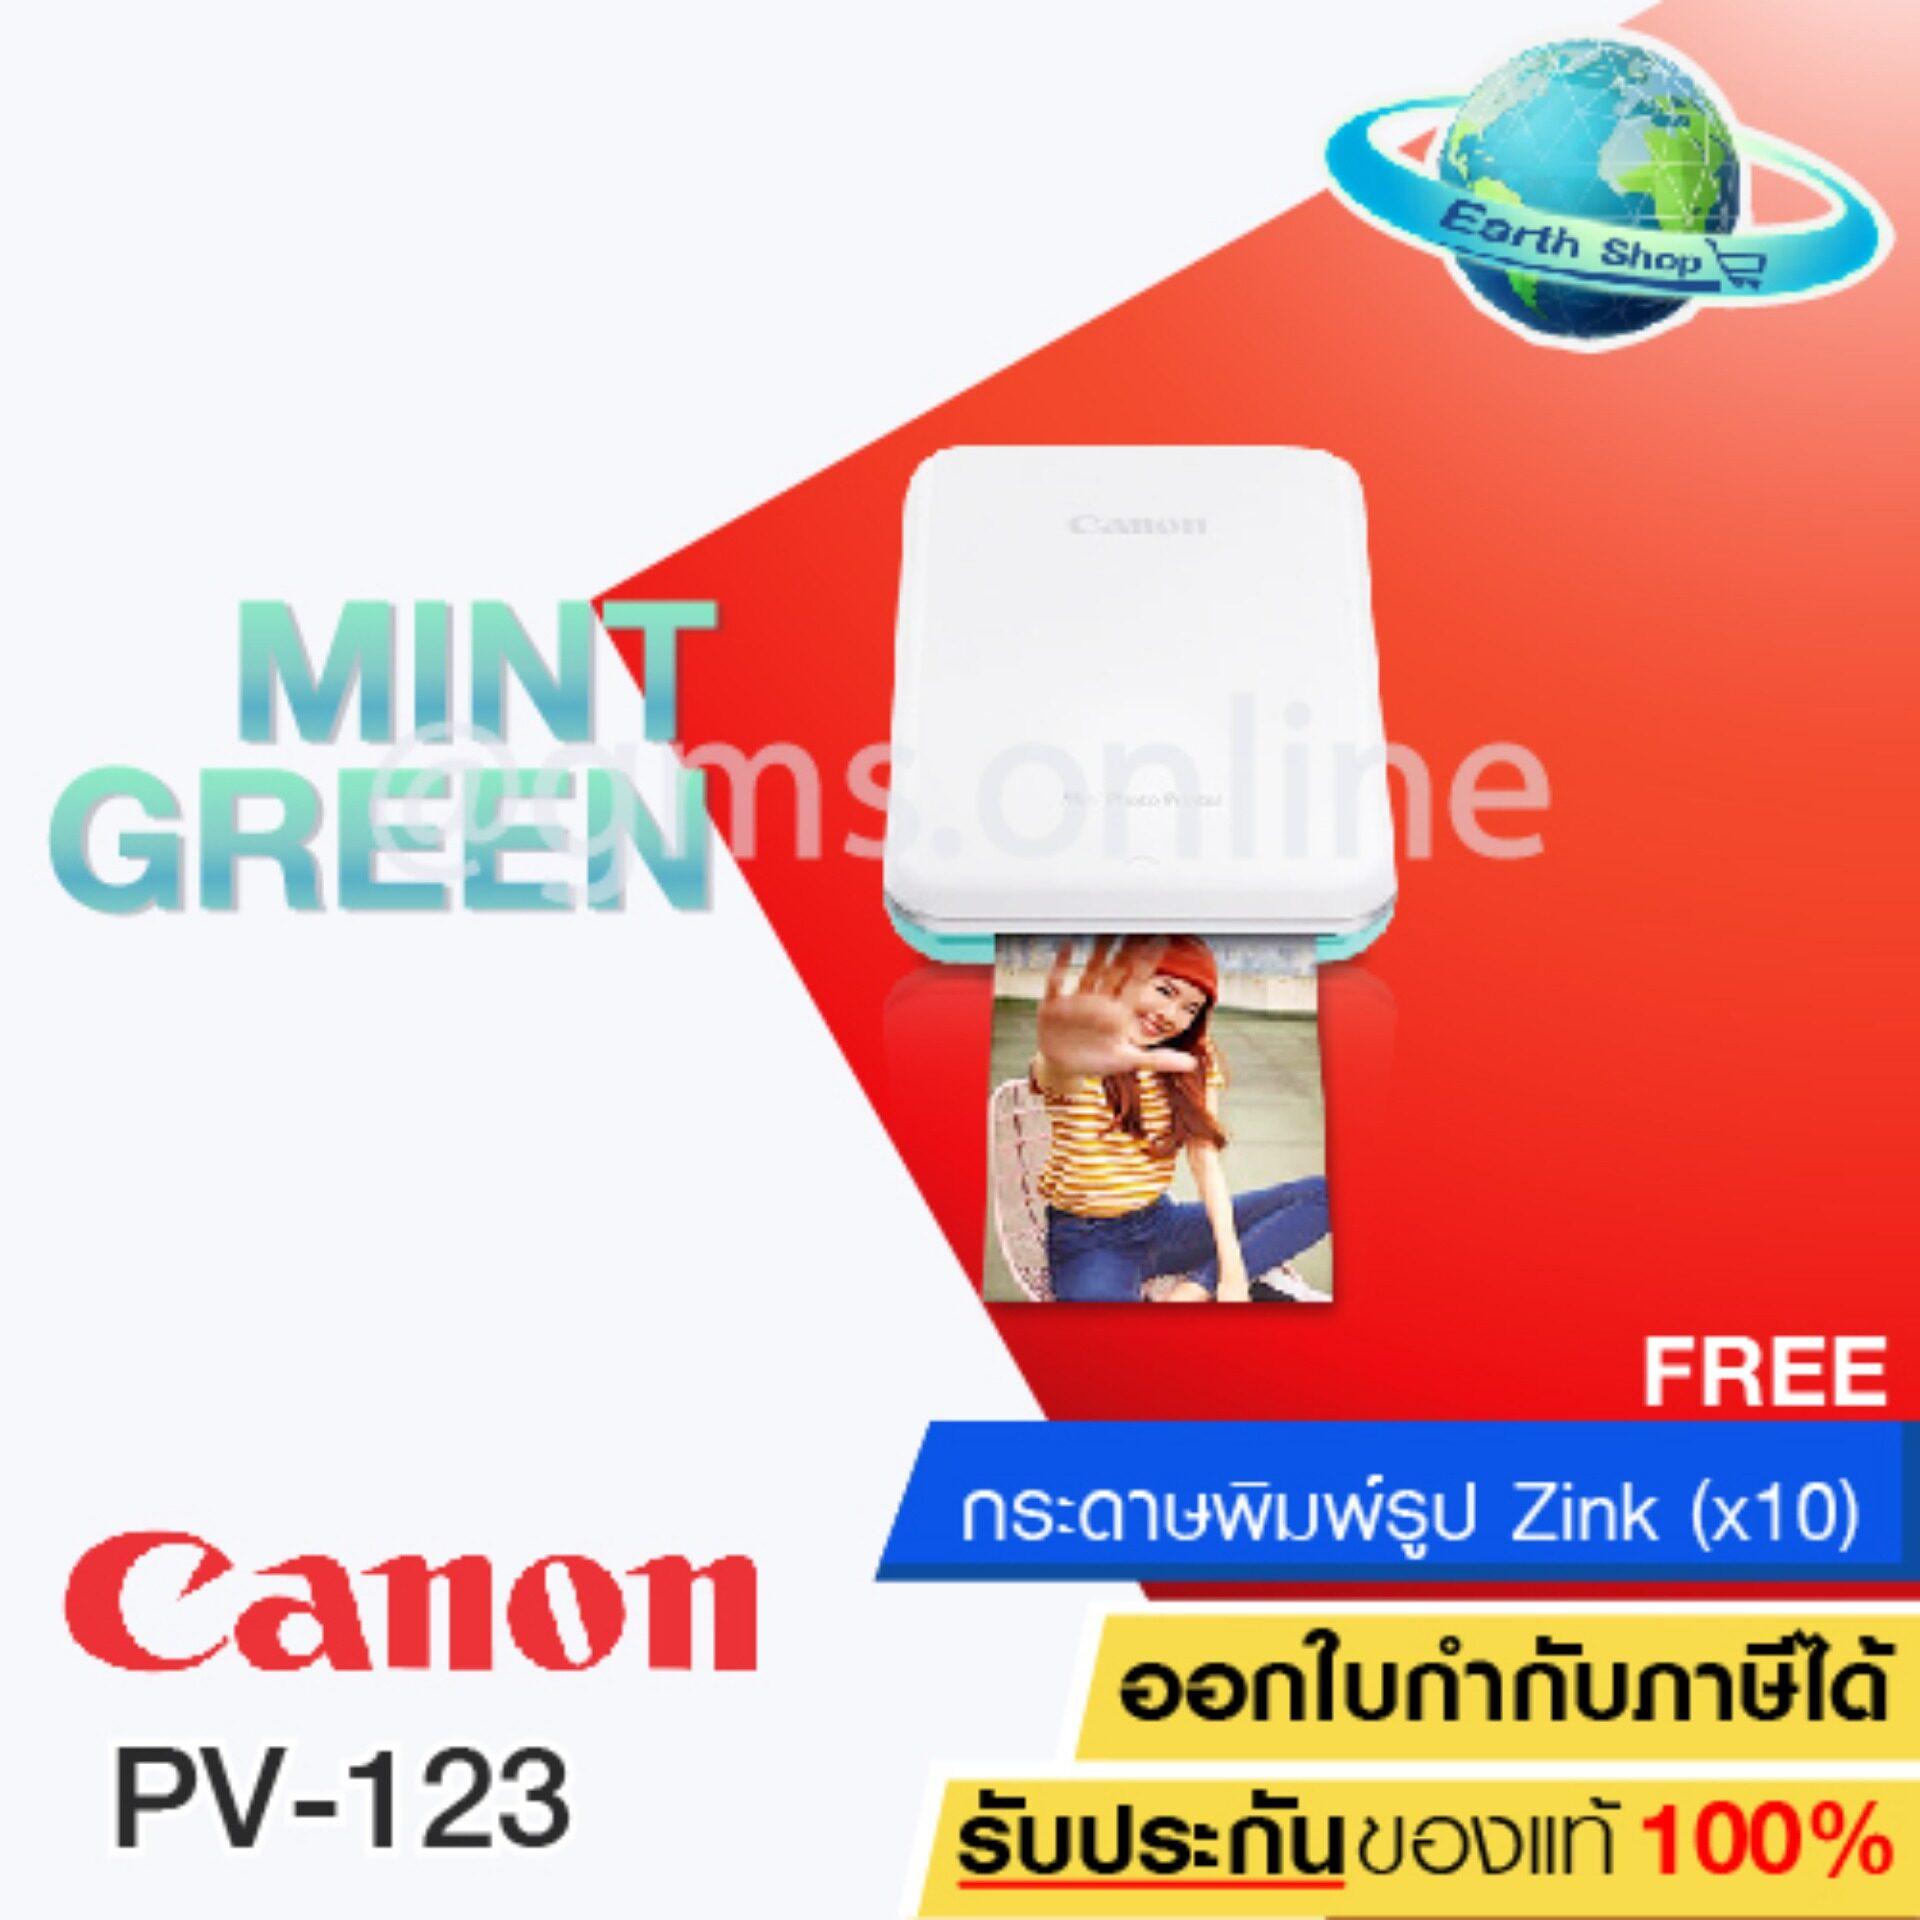 Canon Mini Photo Printer Pv-123 พร้อมกระดาษพิมพ์รูป 10 แผ่น Earth Shop.